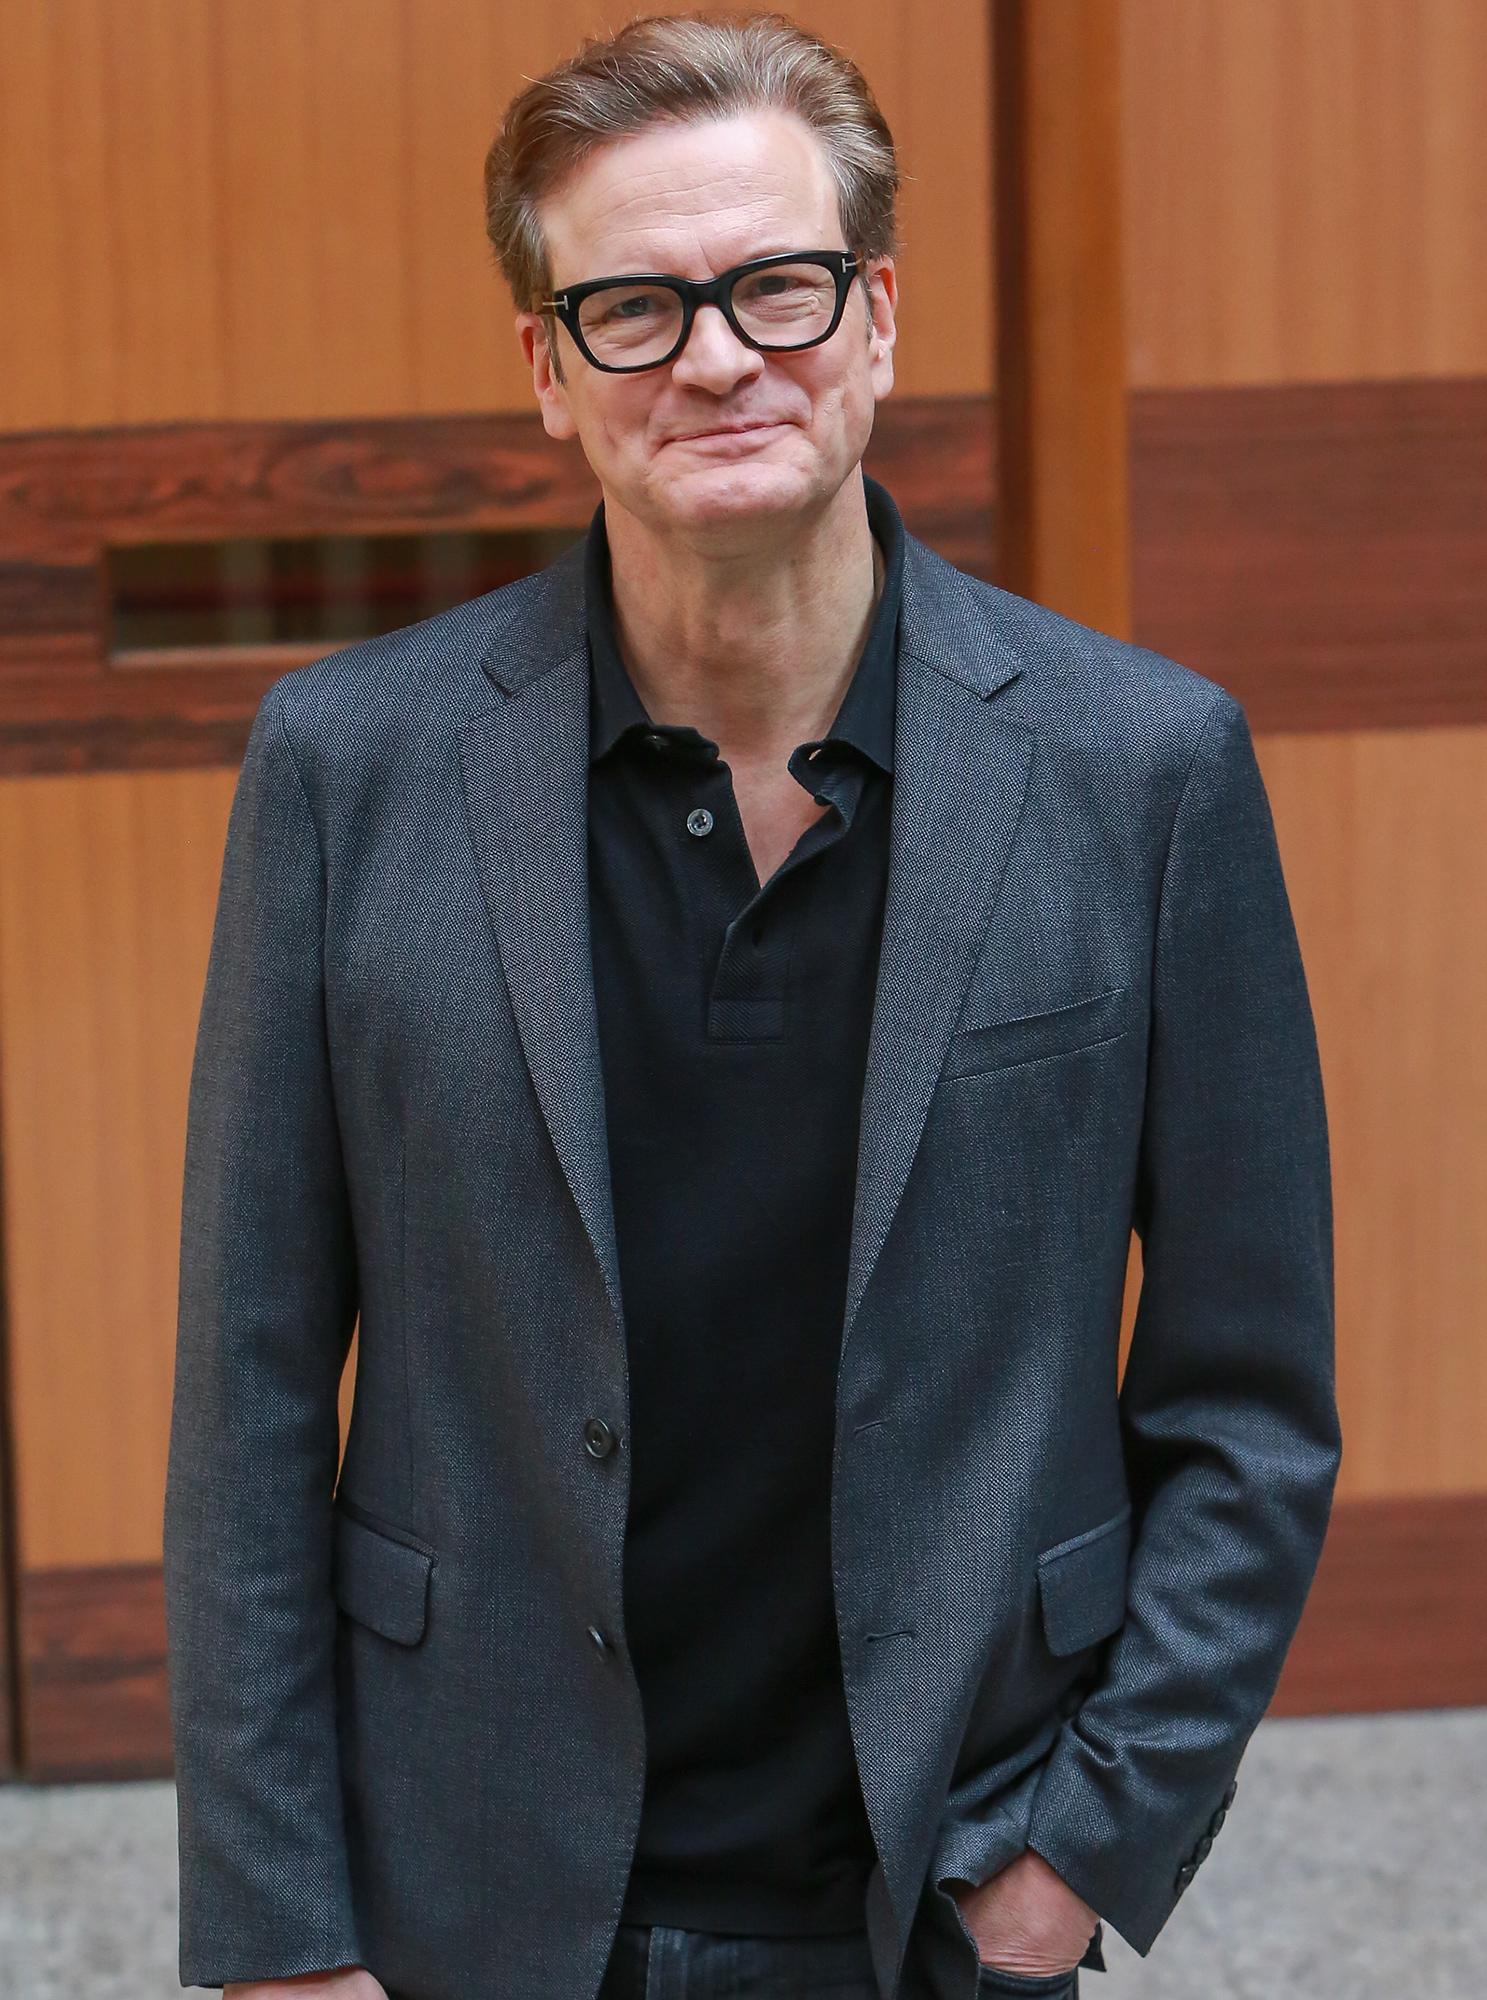 Colin Firth at 'Sapienza University of Rome'